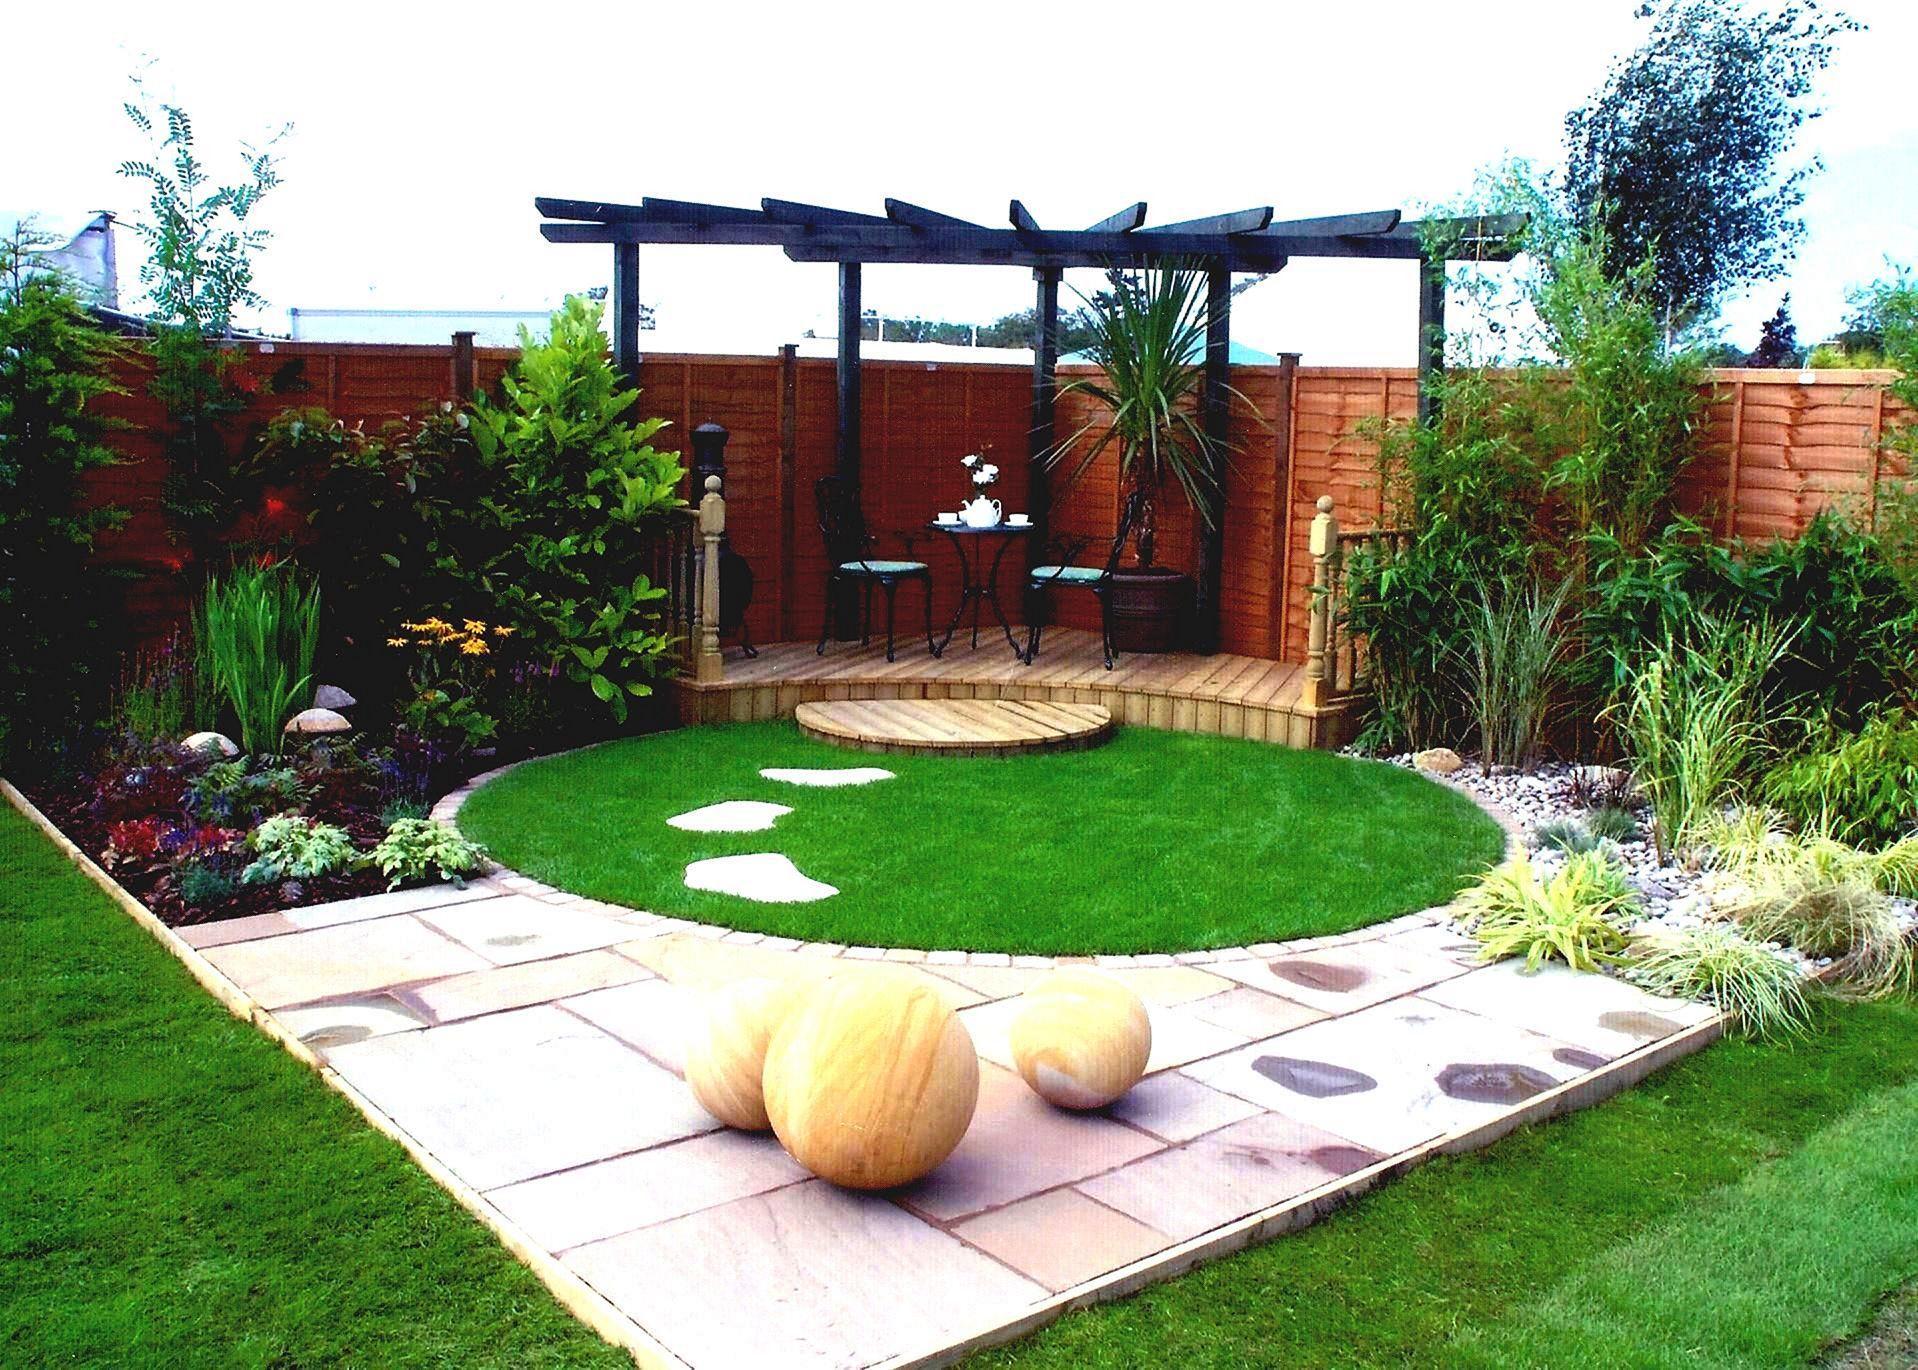 Most Pretty Backyard Garden Landscaping Ideas You Should See Minimalist Garden Dream Garden Backyards Garden Design Backyard garden ideas ontario